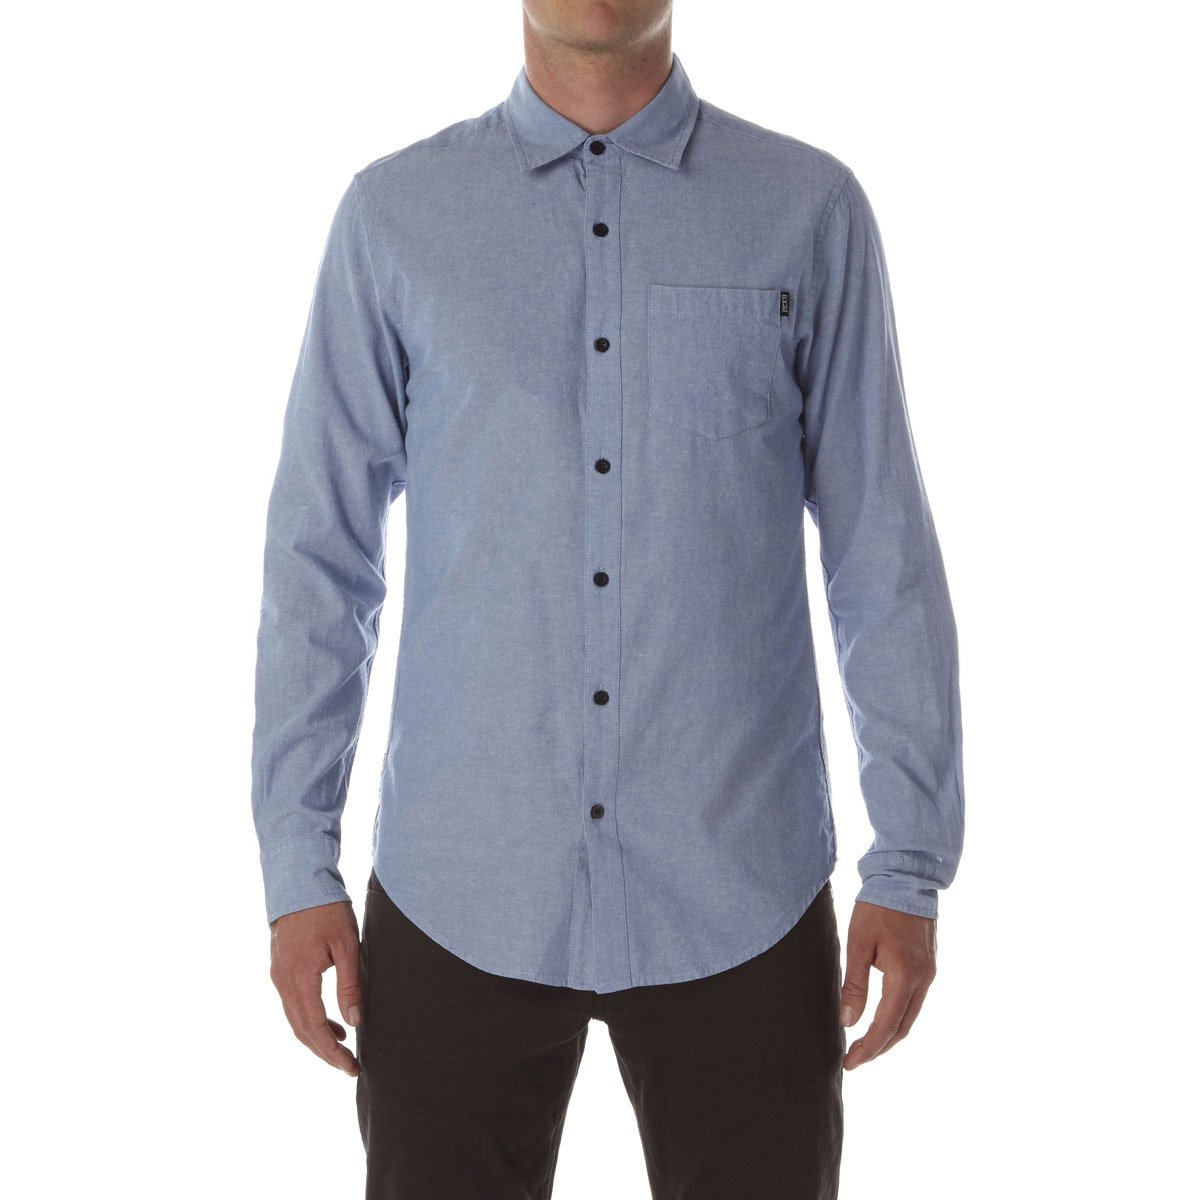 CCS Switch Long Sleeve Woven Shirt Chambray